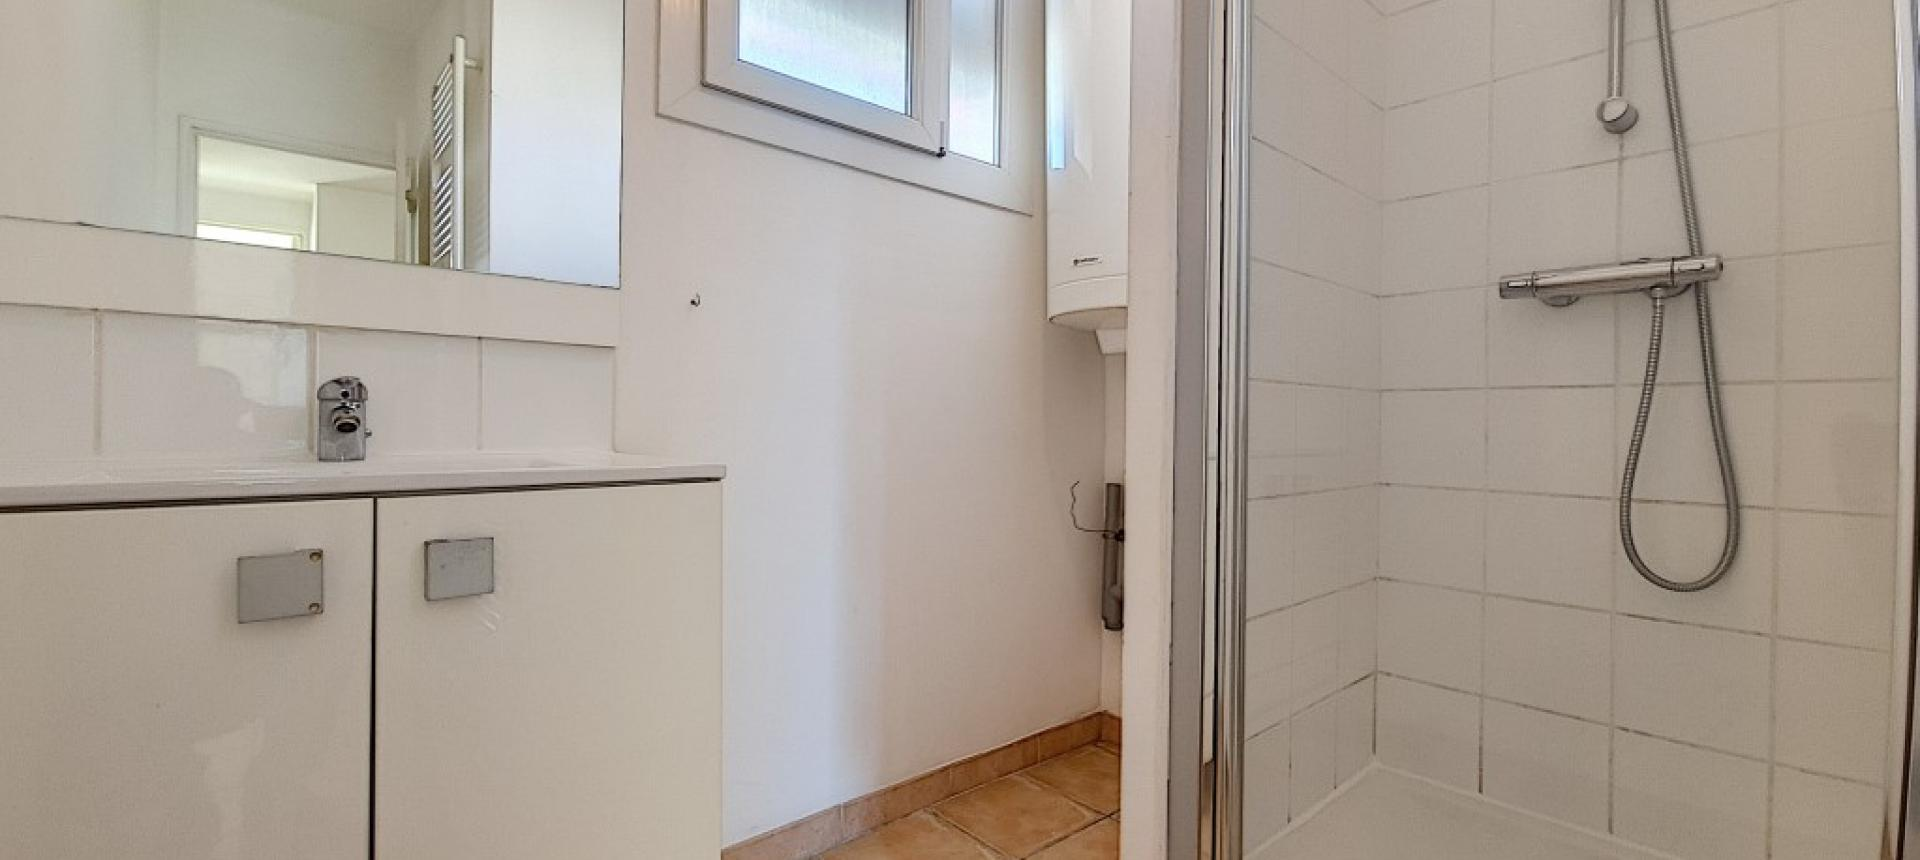 F4 à louer Kennedy salle de douche